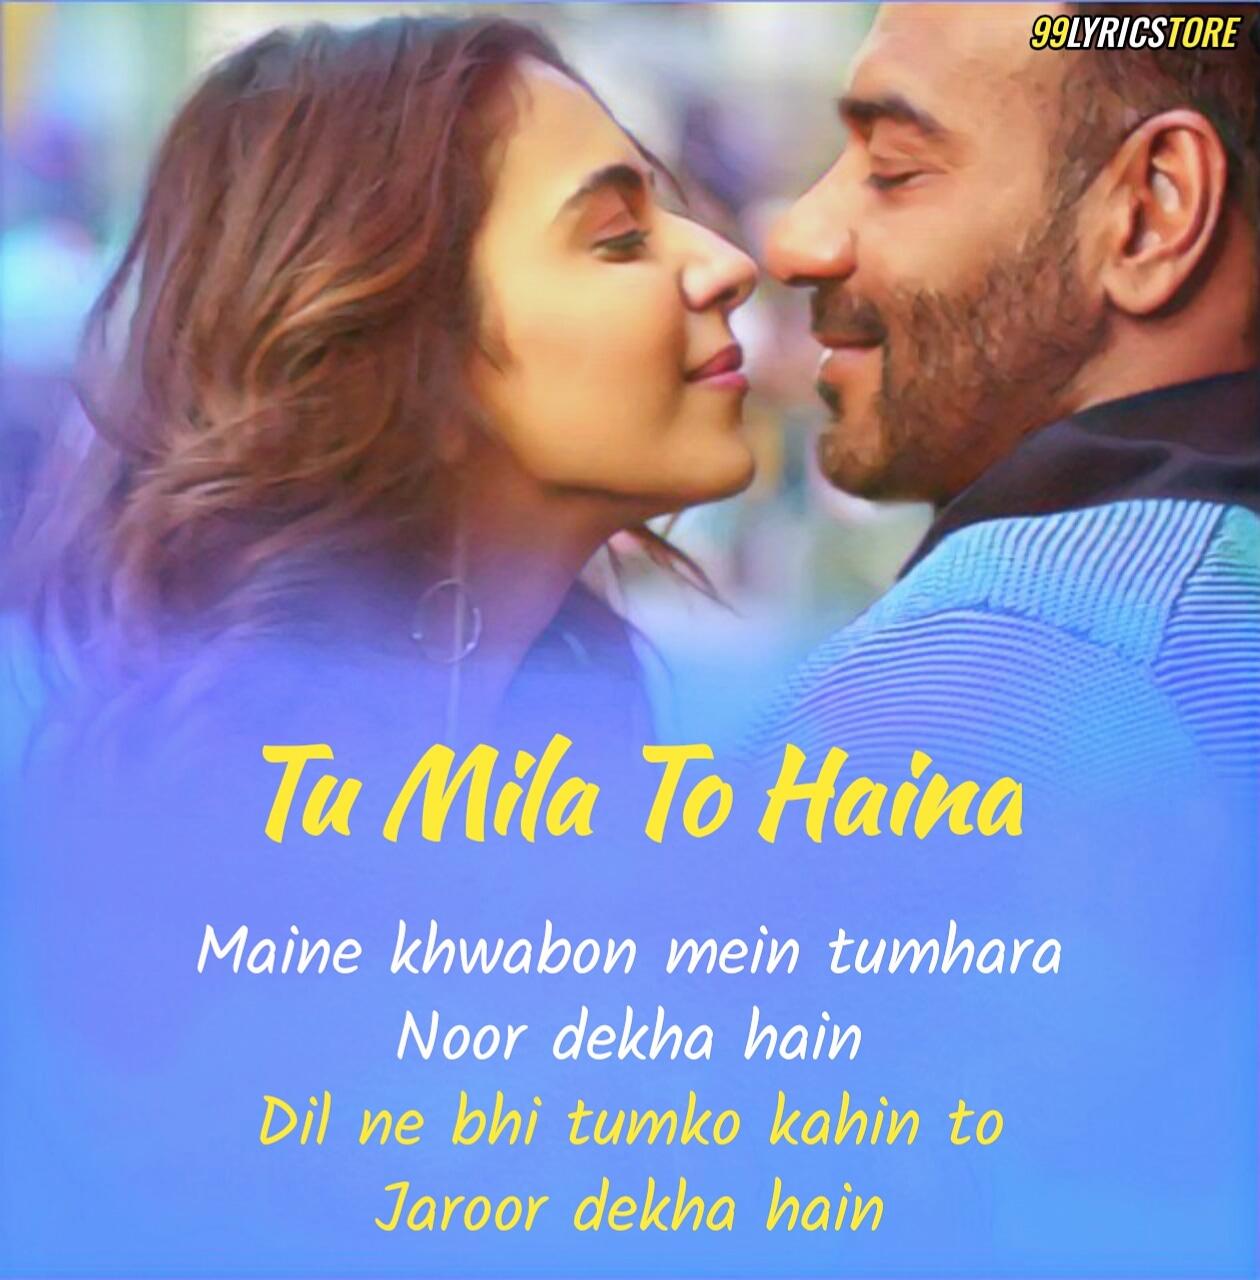 Tu Mila To Haina love Hindi song lyrics sung by Arijit Singh from movie 'De De Pyaar De'